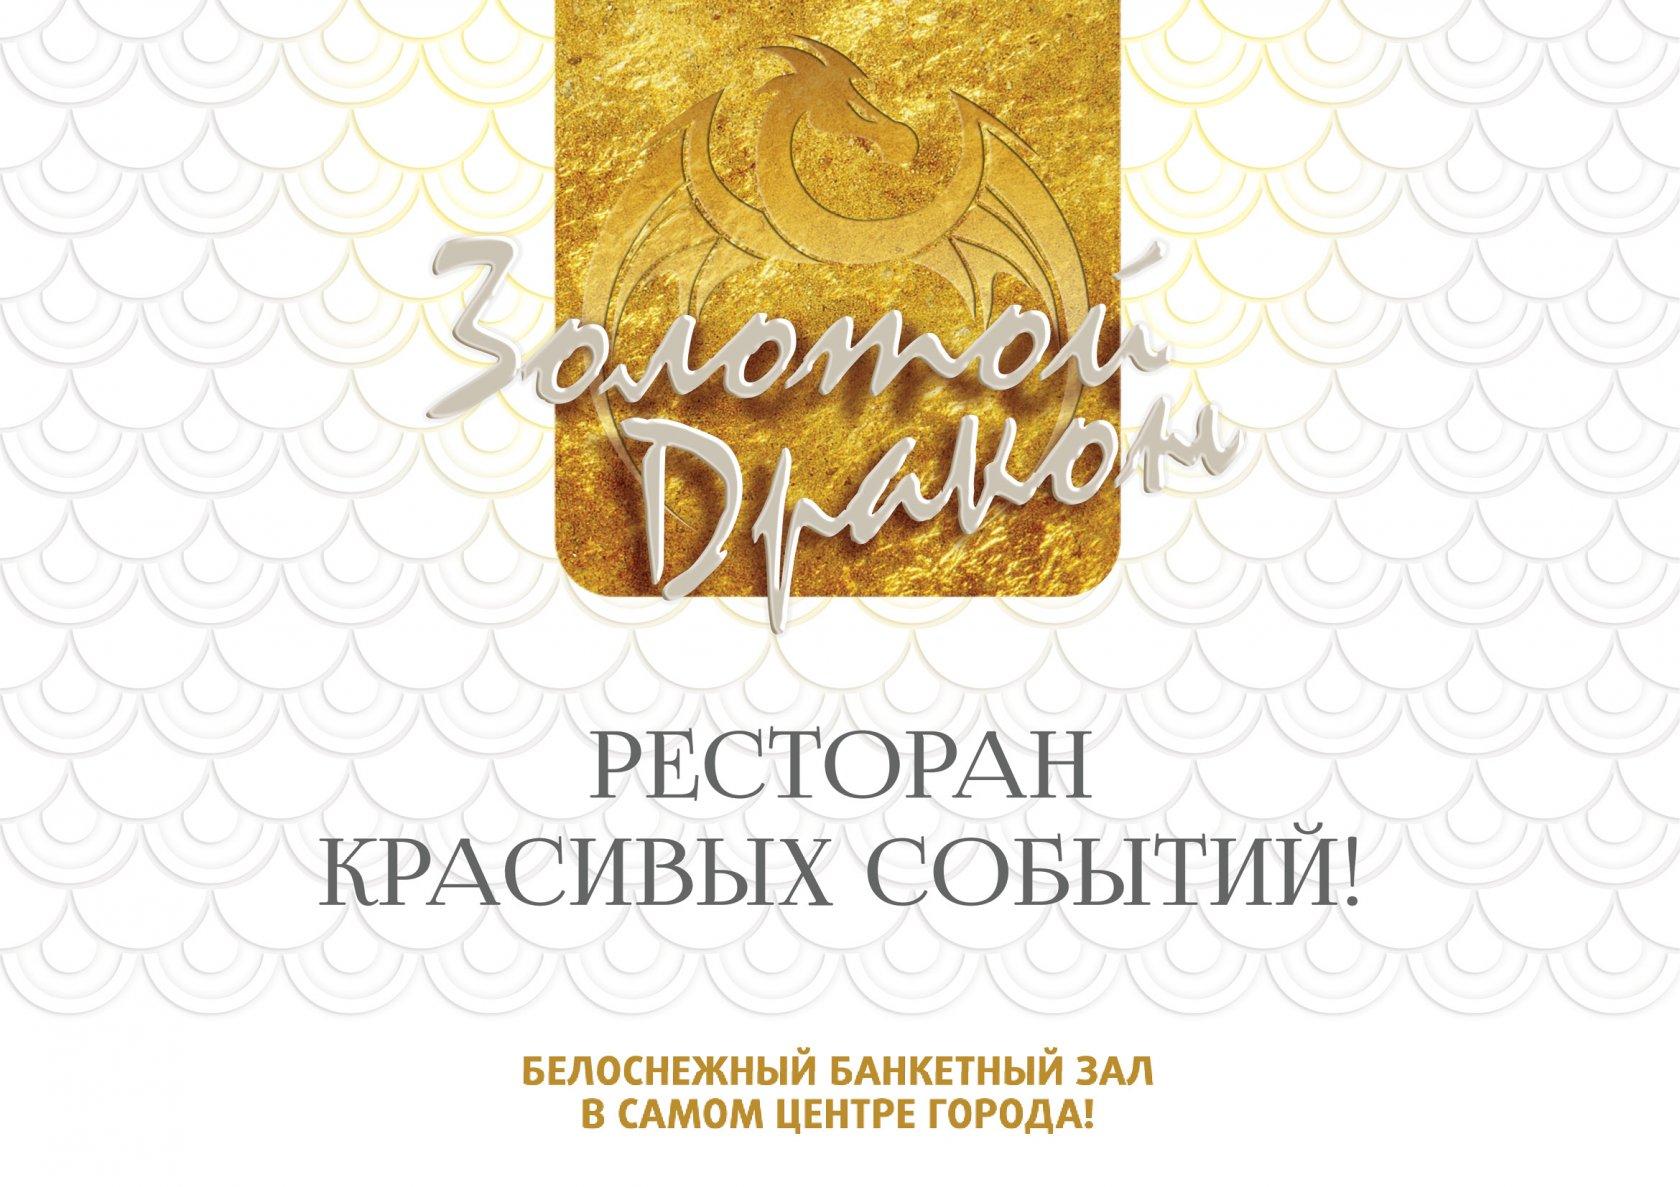 ресторан золотой дракон улан-удэ